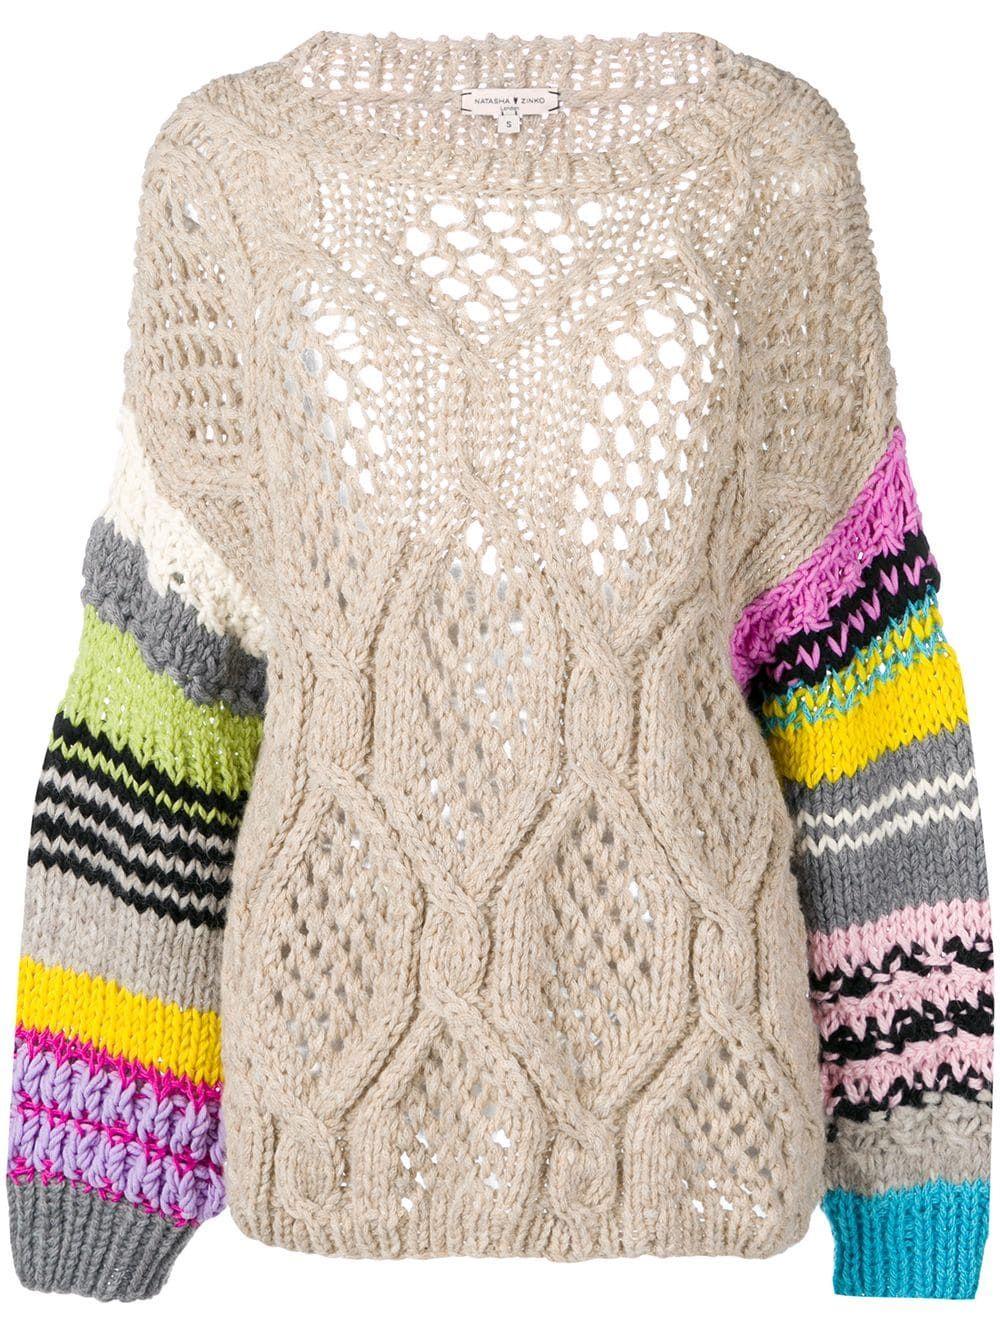 2dba8bf27fe Natasha Zinko chunky knit jumper - Neutrals   Products in 2019 ...